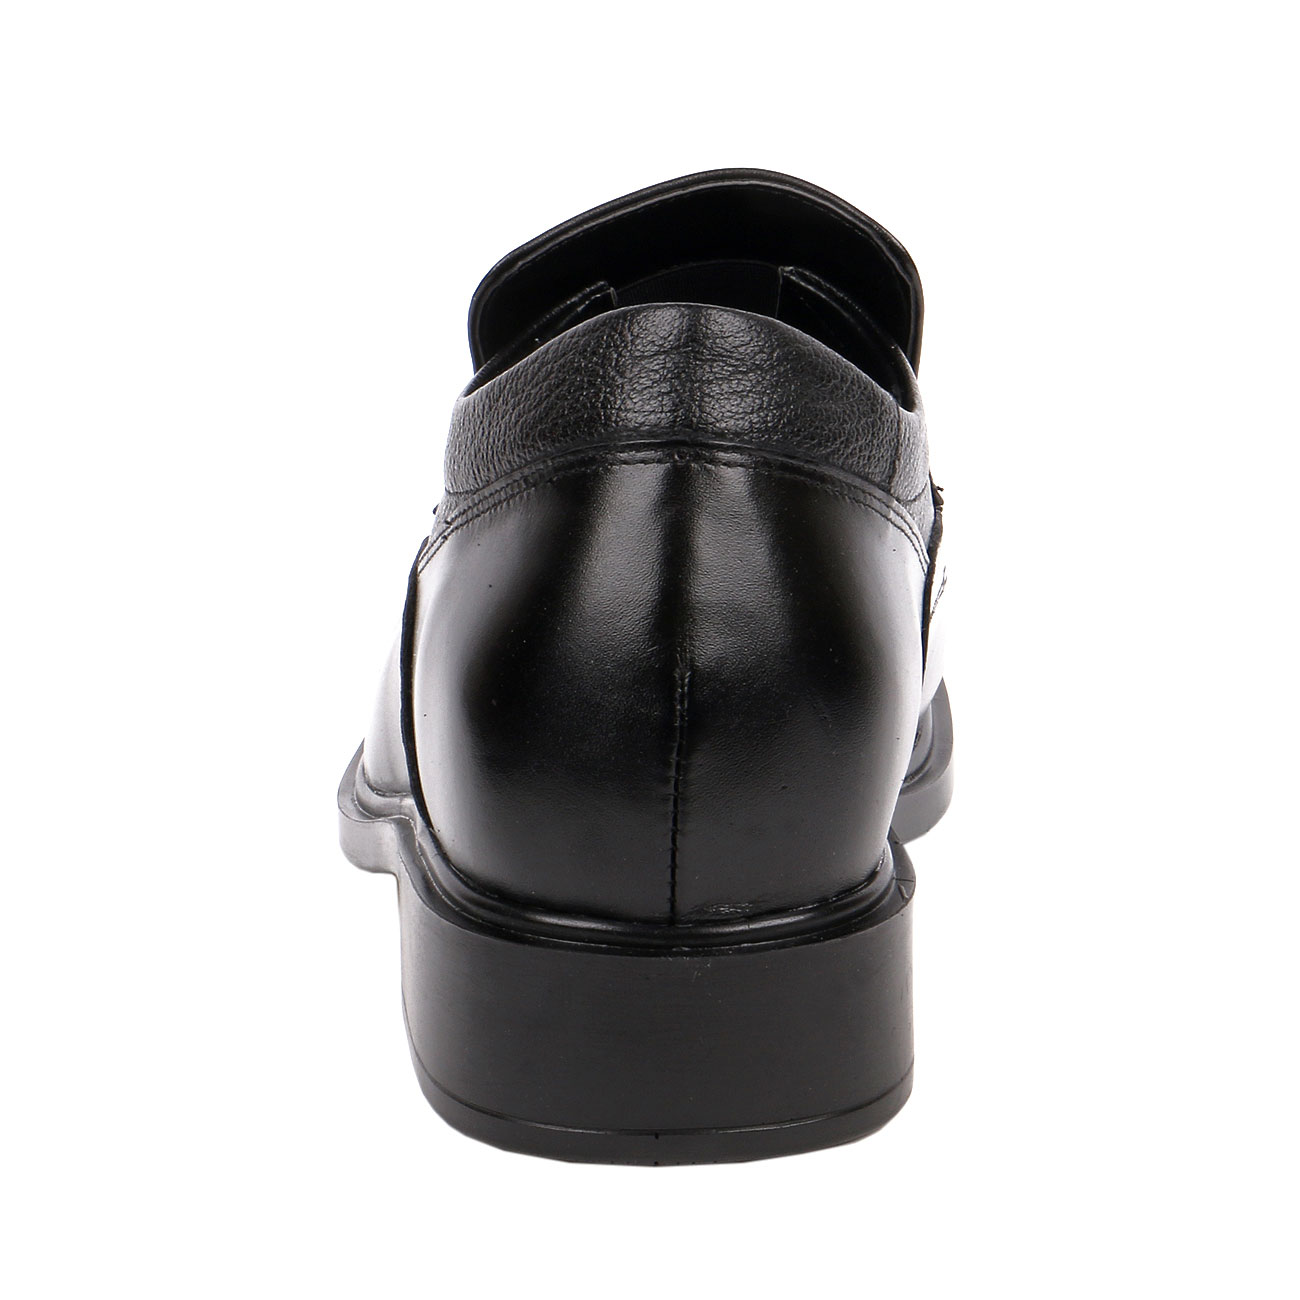 KL602, Limited Version of Metal Bit Loafer More Attractive Gentlemen Make An Effort To Look Good-3